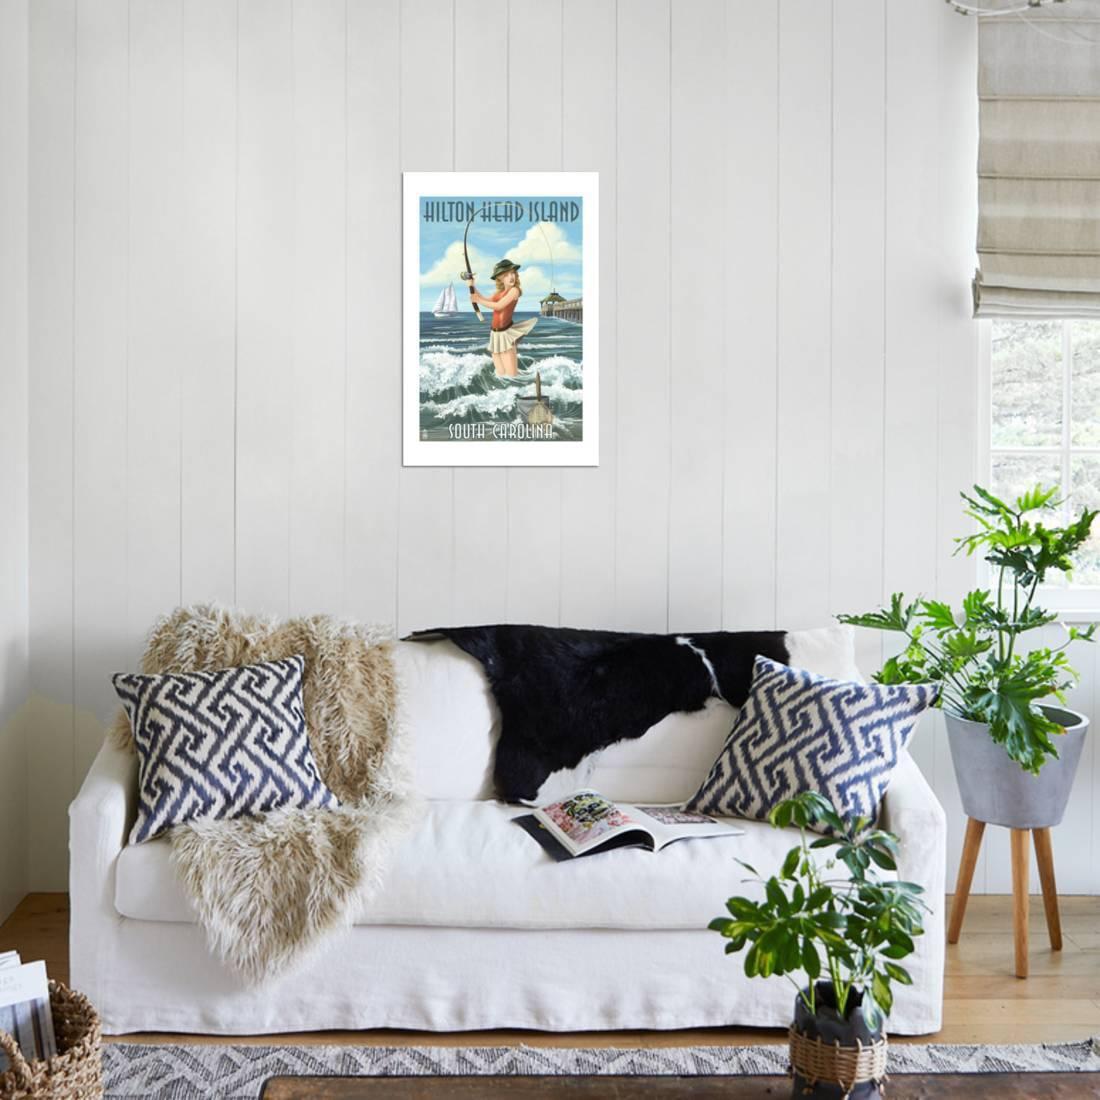 Hilton Head Island South Carolina Pinup Surfer Fishing Print Wall